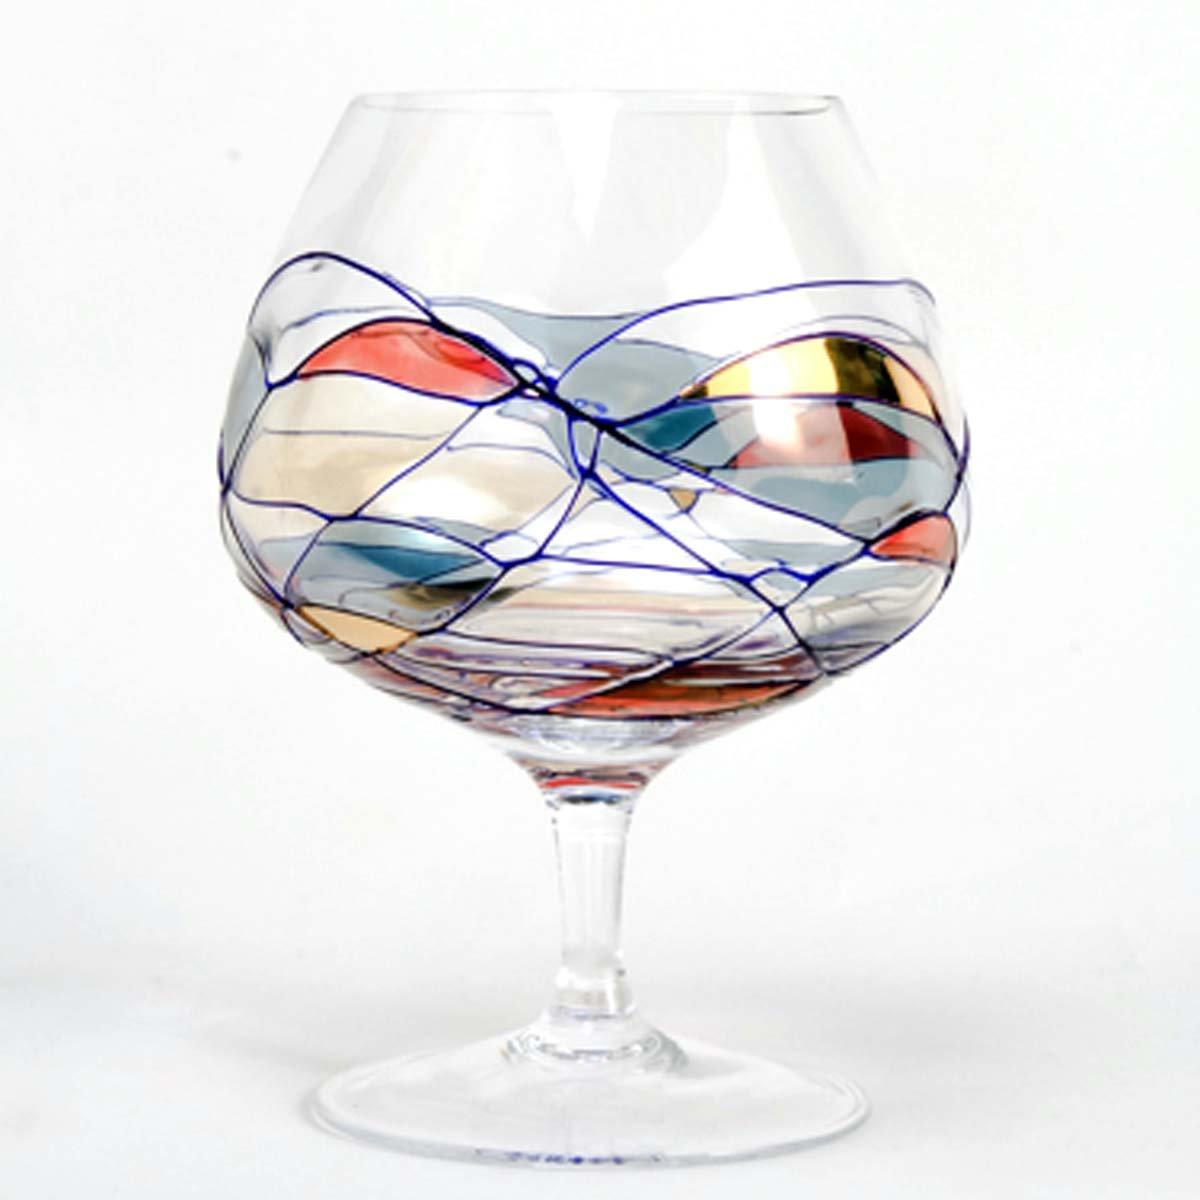 Set Of Four (4) - Romanian Crystal Barware - Cobalt Blue Swirl/Stained Glass Pattern - Milano Design - 15 Oz Brandy Glassware